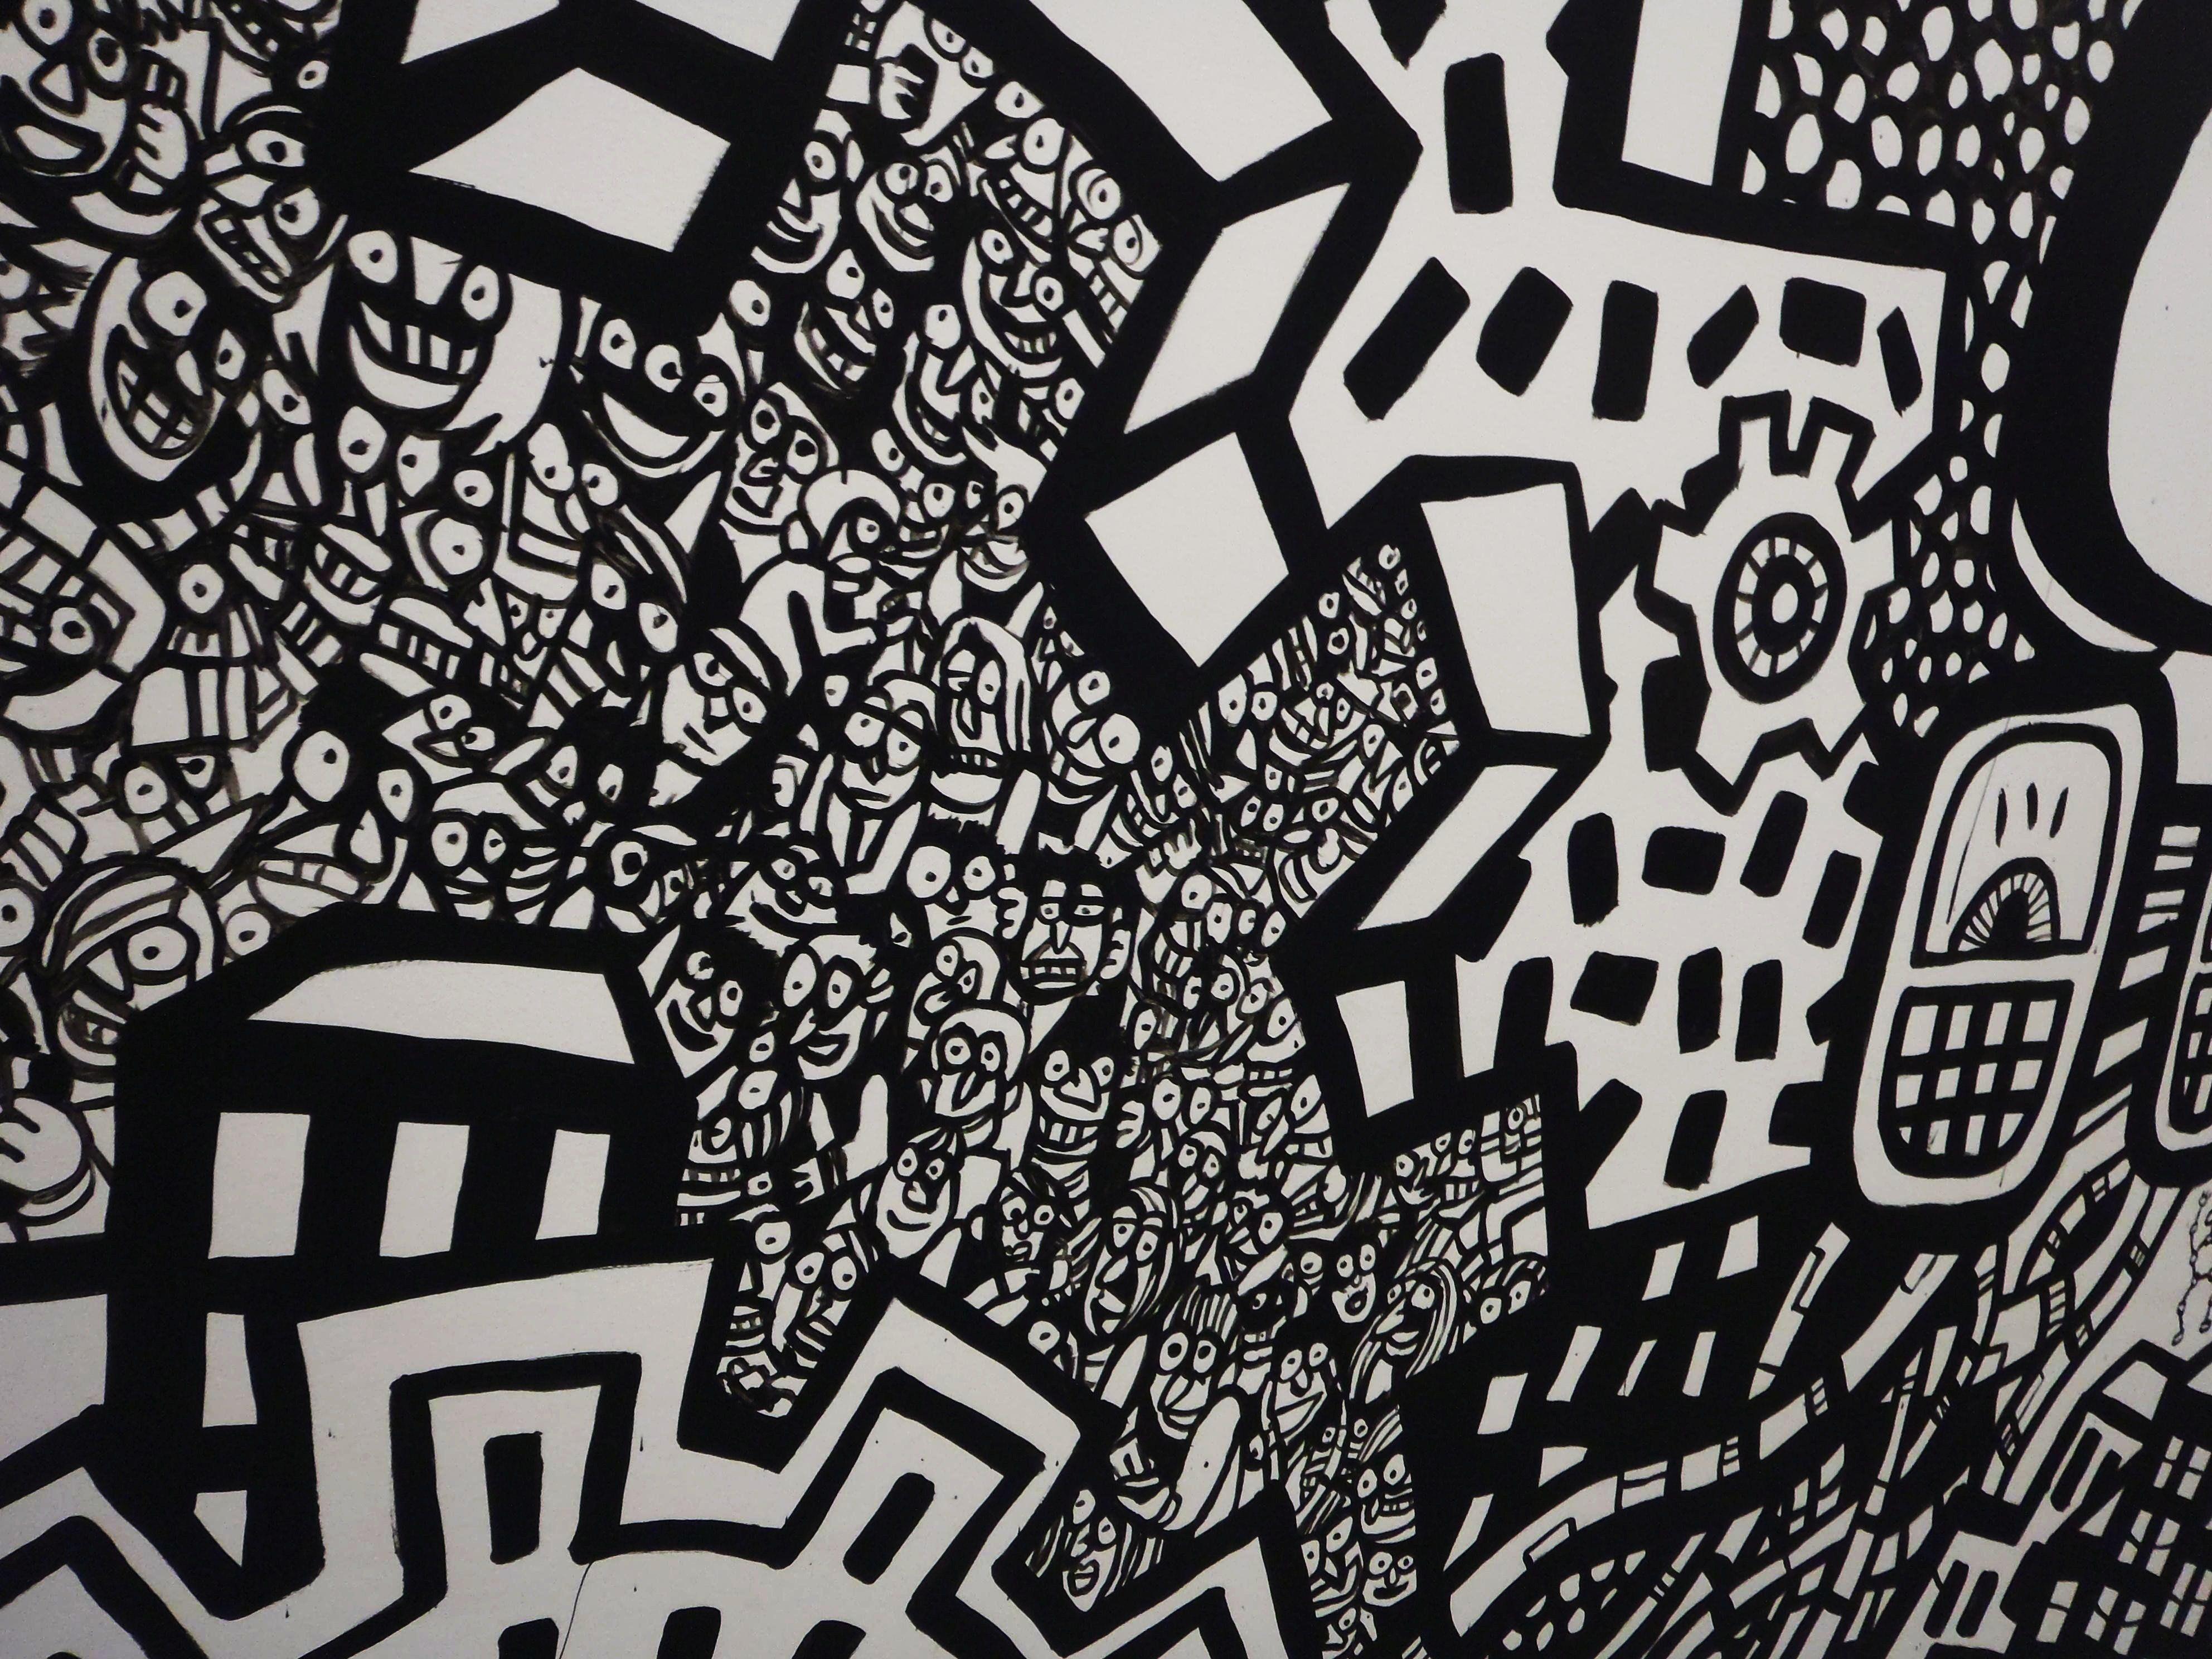 Graffiti Hd Desktop Background Wallpapers A Graffiti Murals Black And White Wallpapers White Art